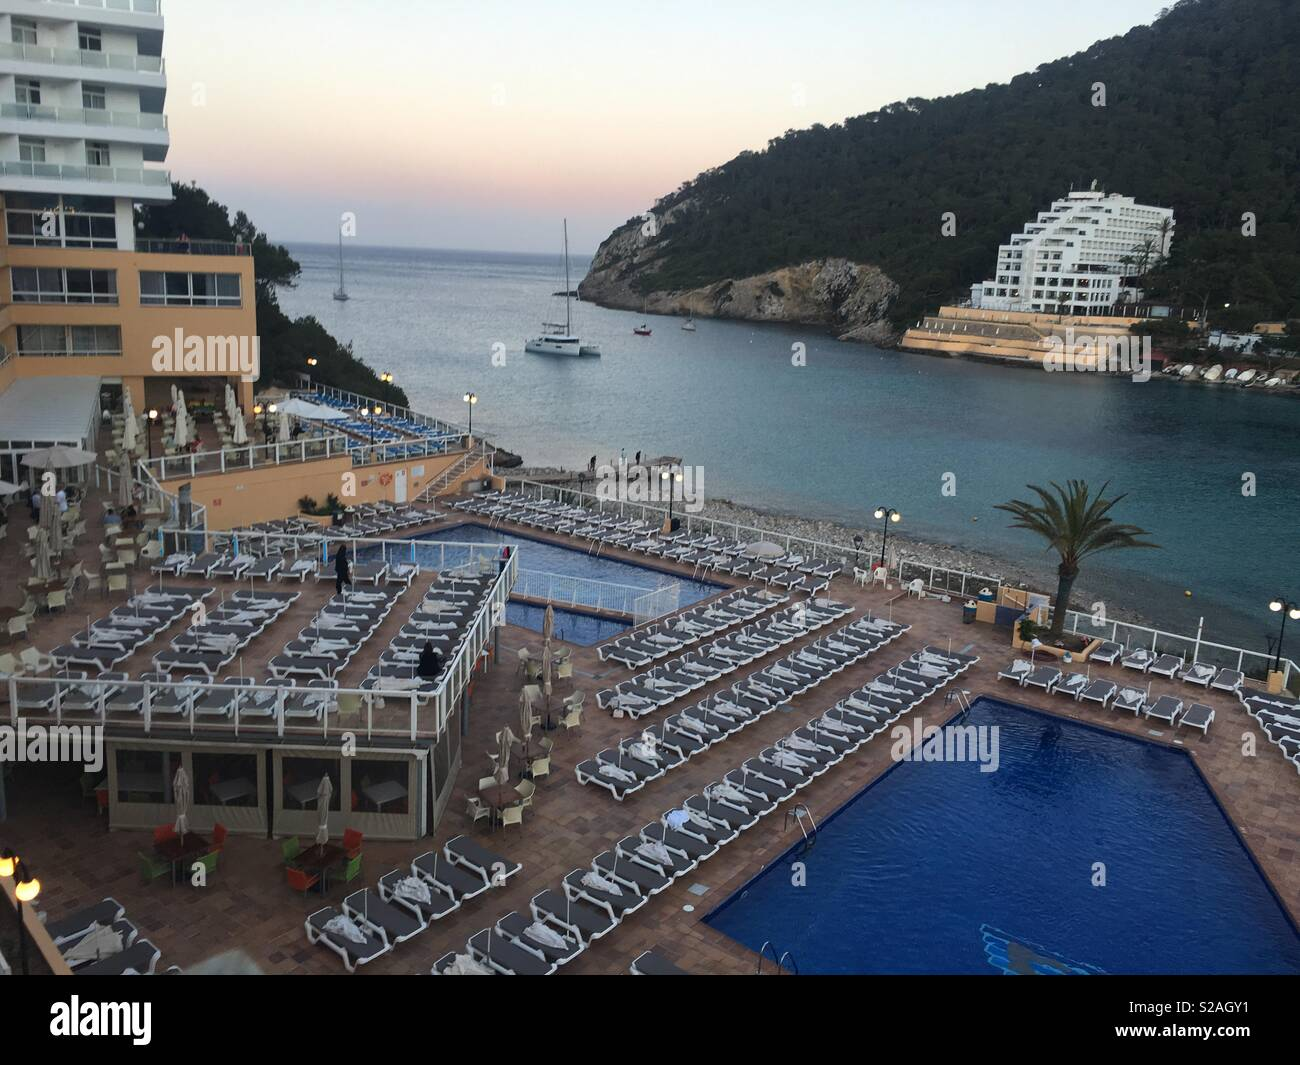 Me Hotel Ibiza Stock Photos & Me Hotel Ibiza Stock Images